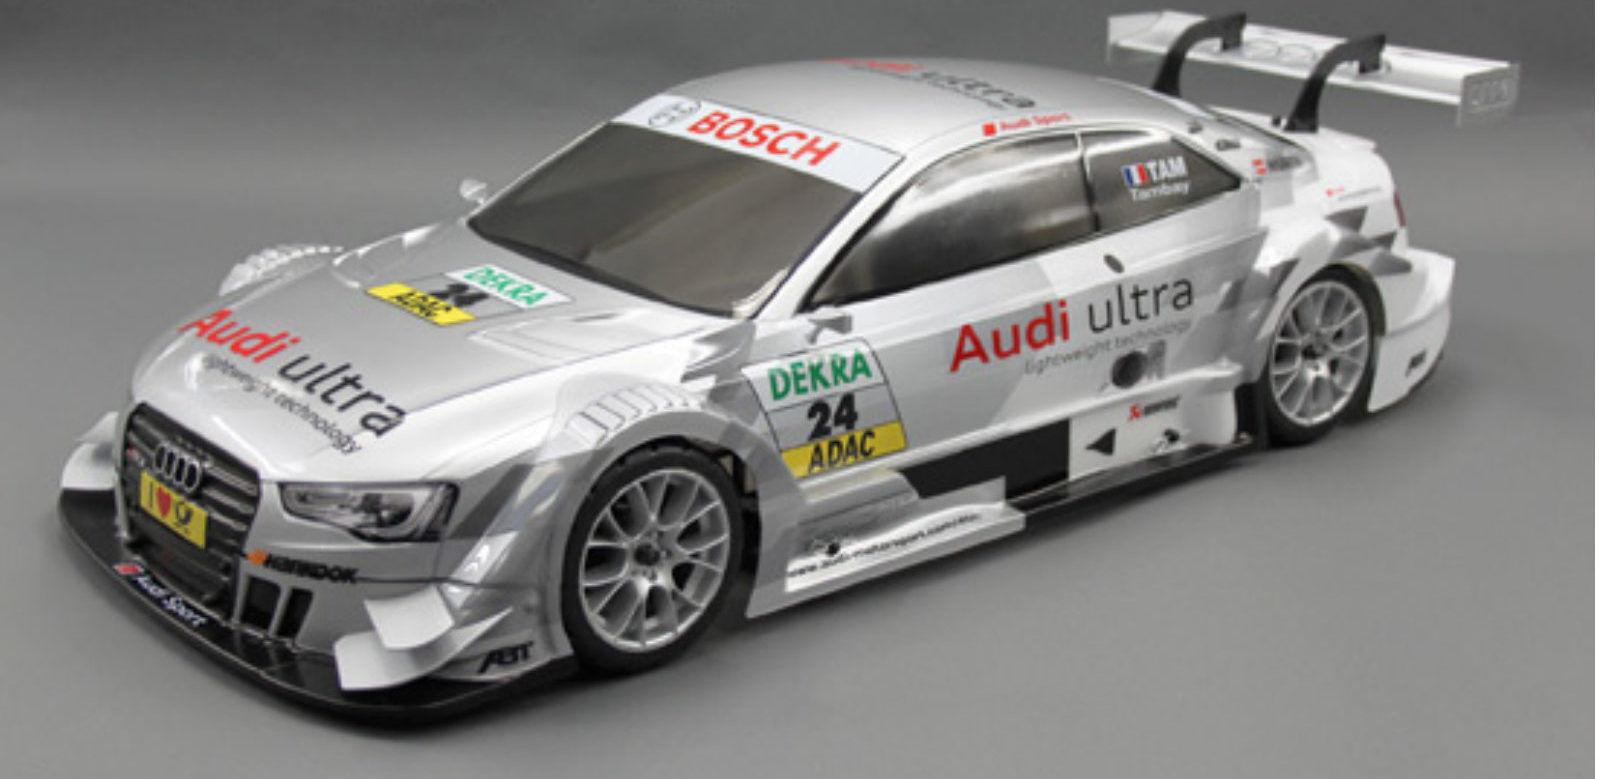 FG modellsport r Sports 530 4wd RTR AUDI RS5 LACADO DE GASOLINA 26ccm